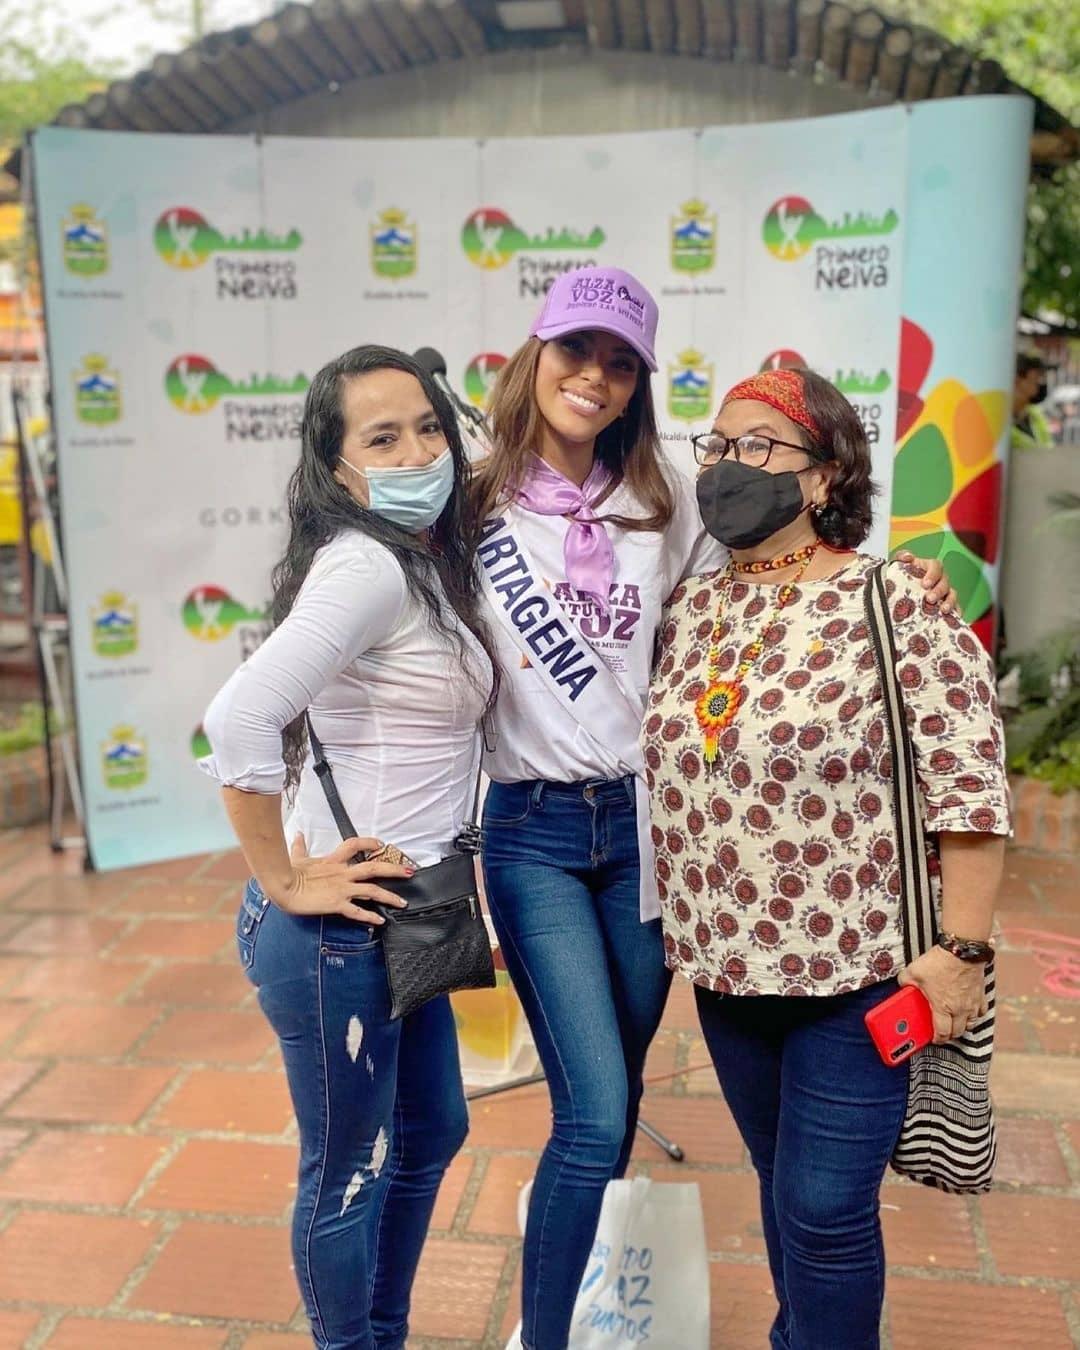 valeria ayos bossa, miss universe colombia 2021/miss water earth 2018. - Página 20 24068611